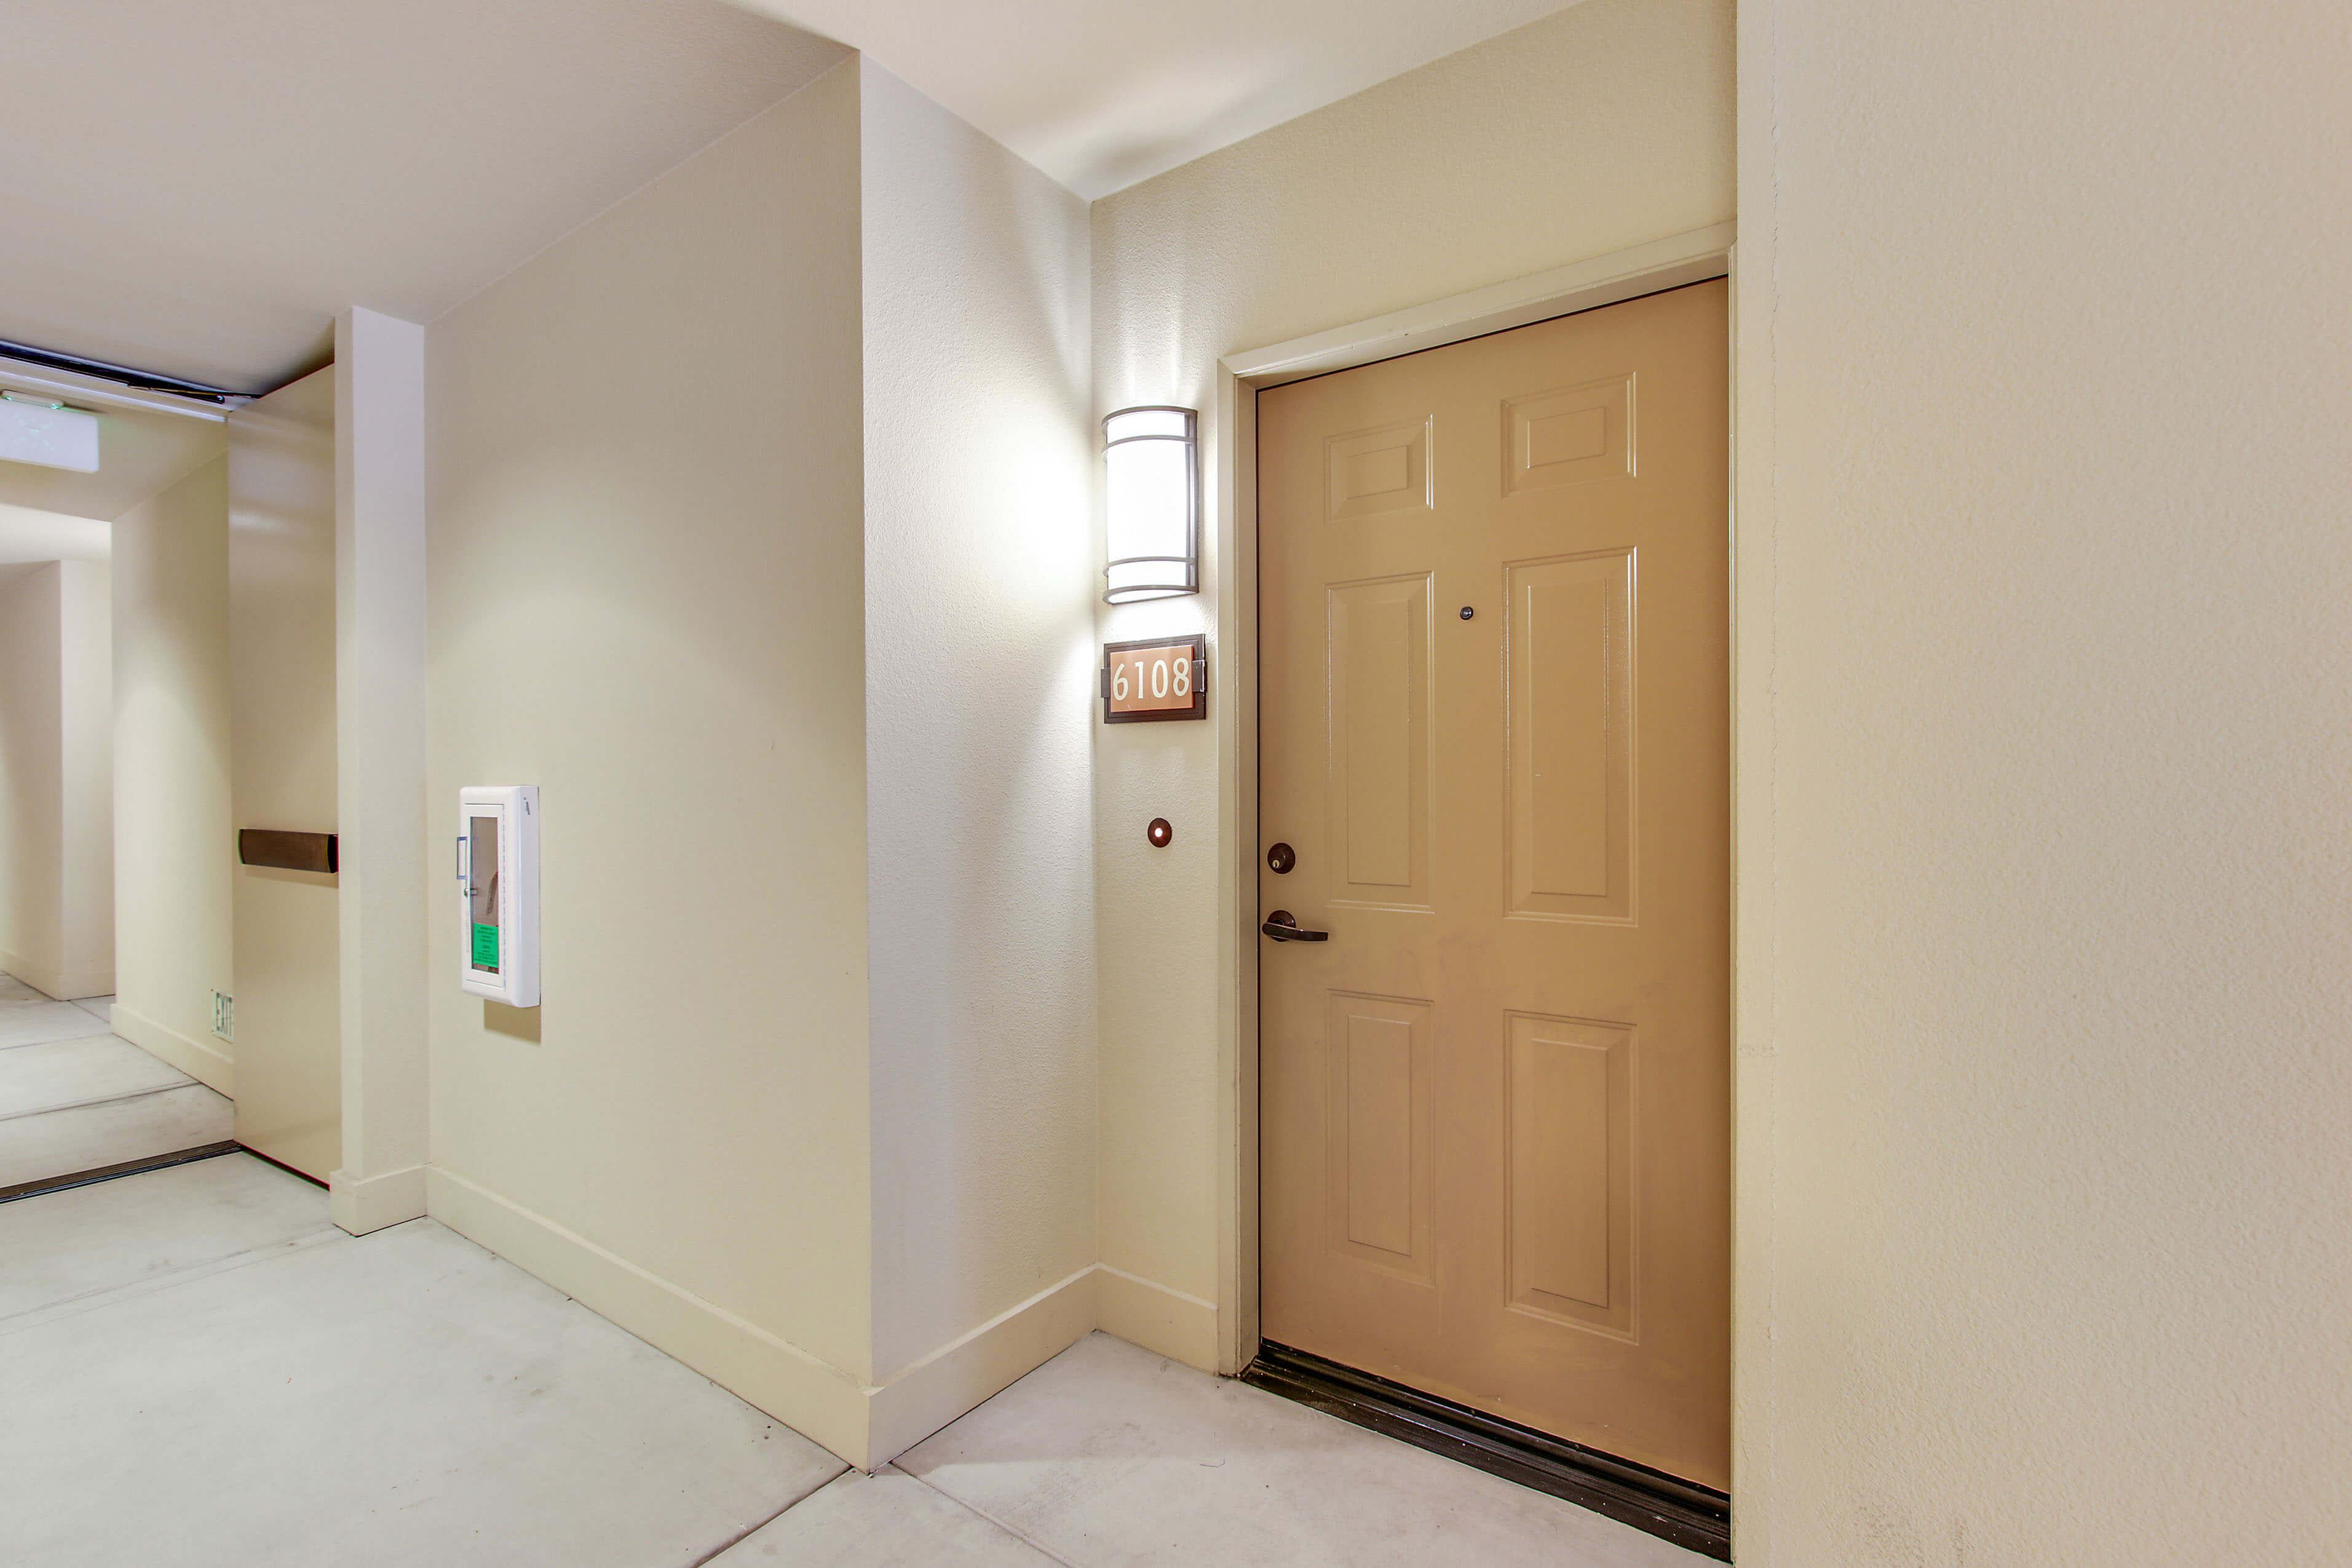 irvine furnished 1 bedroom apartment for rent 5880 per